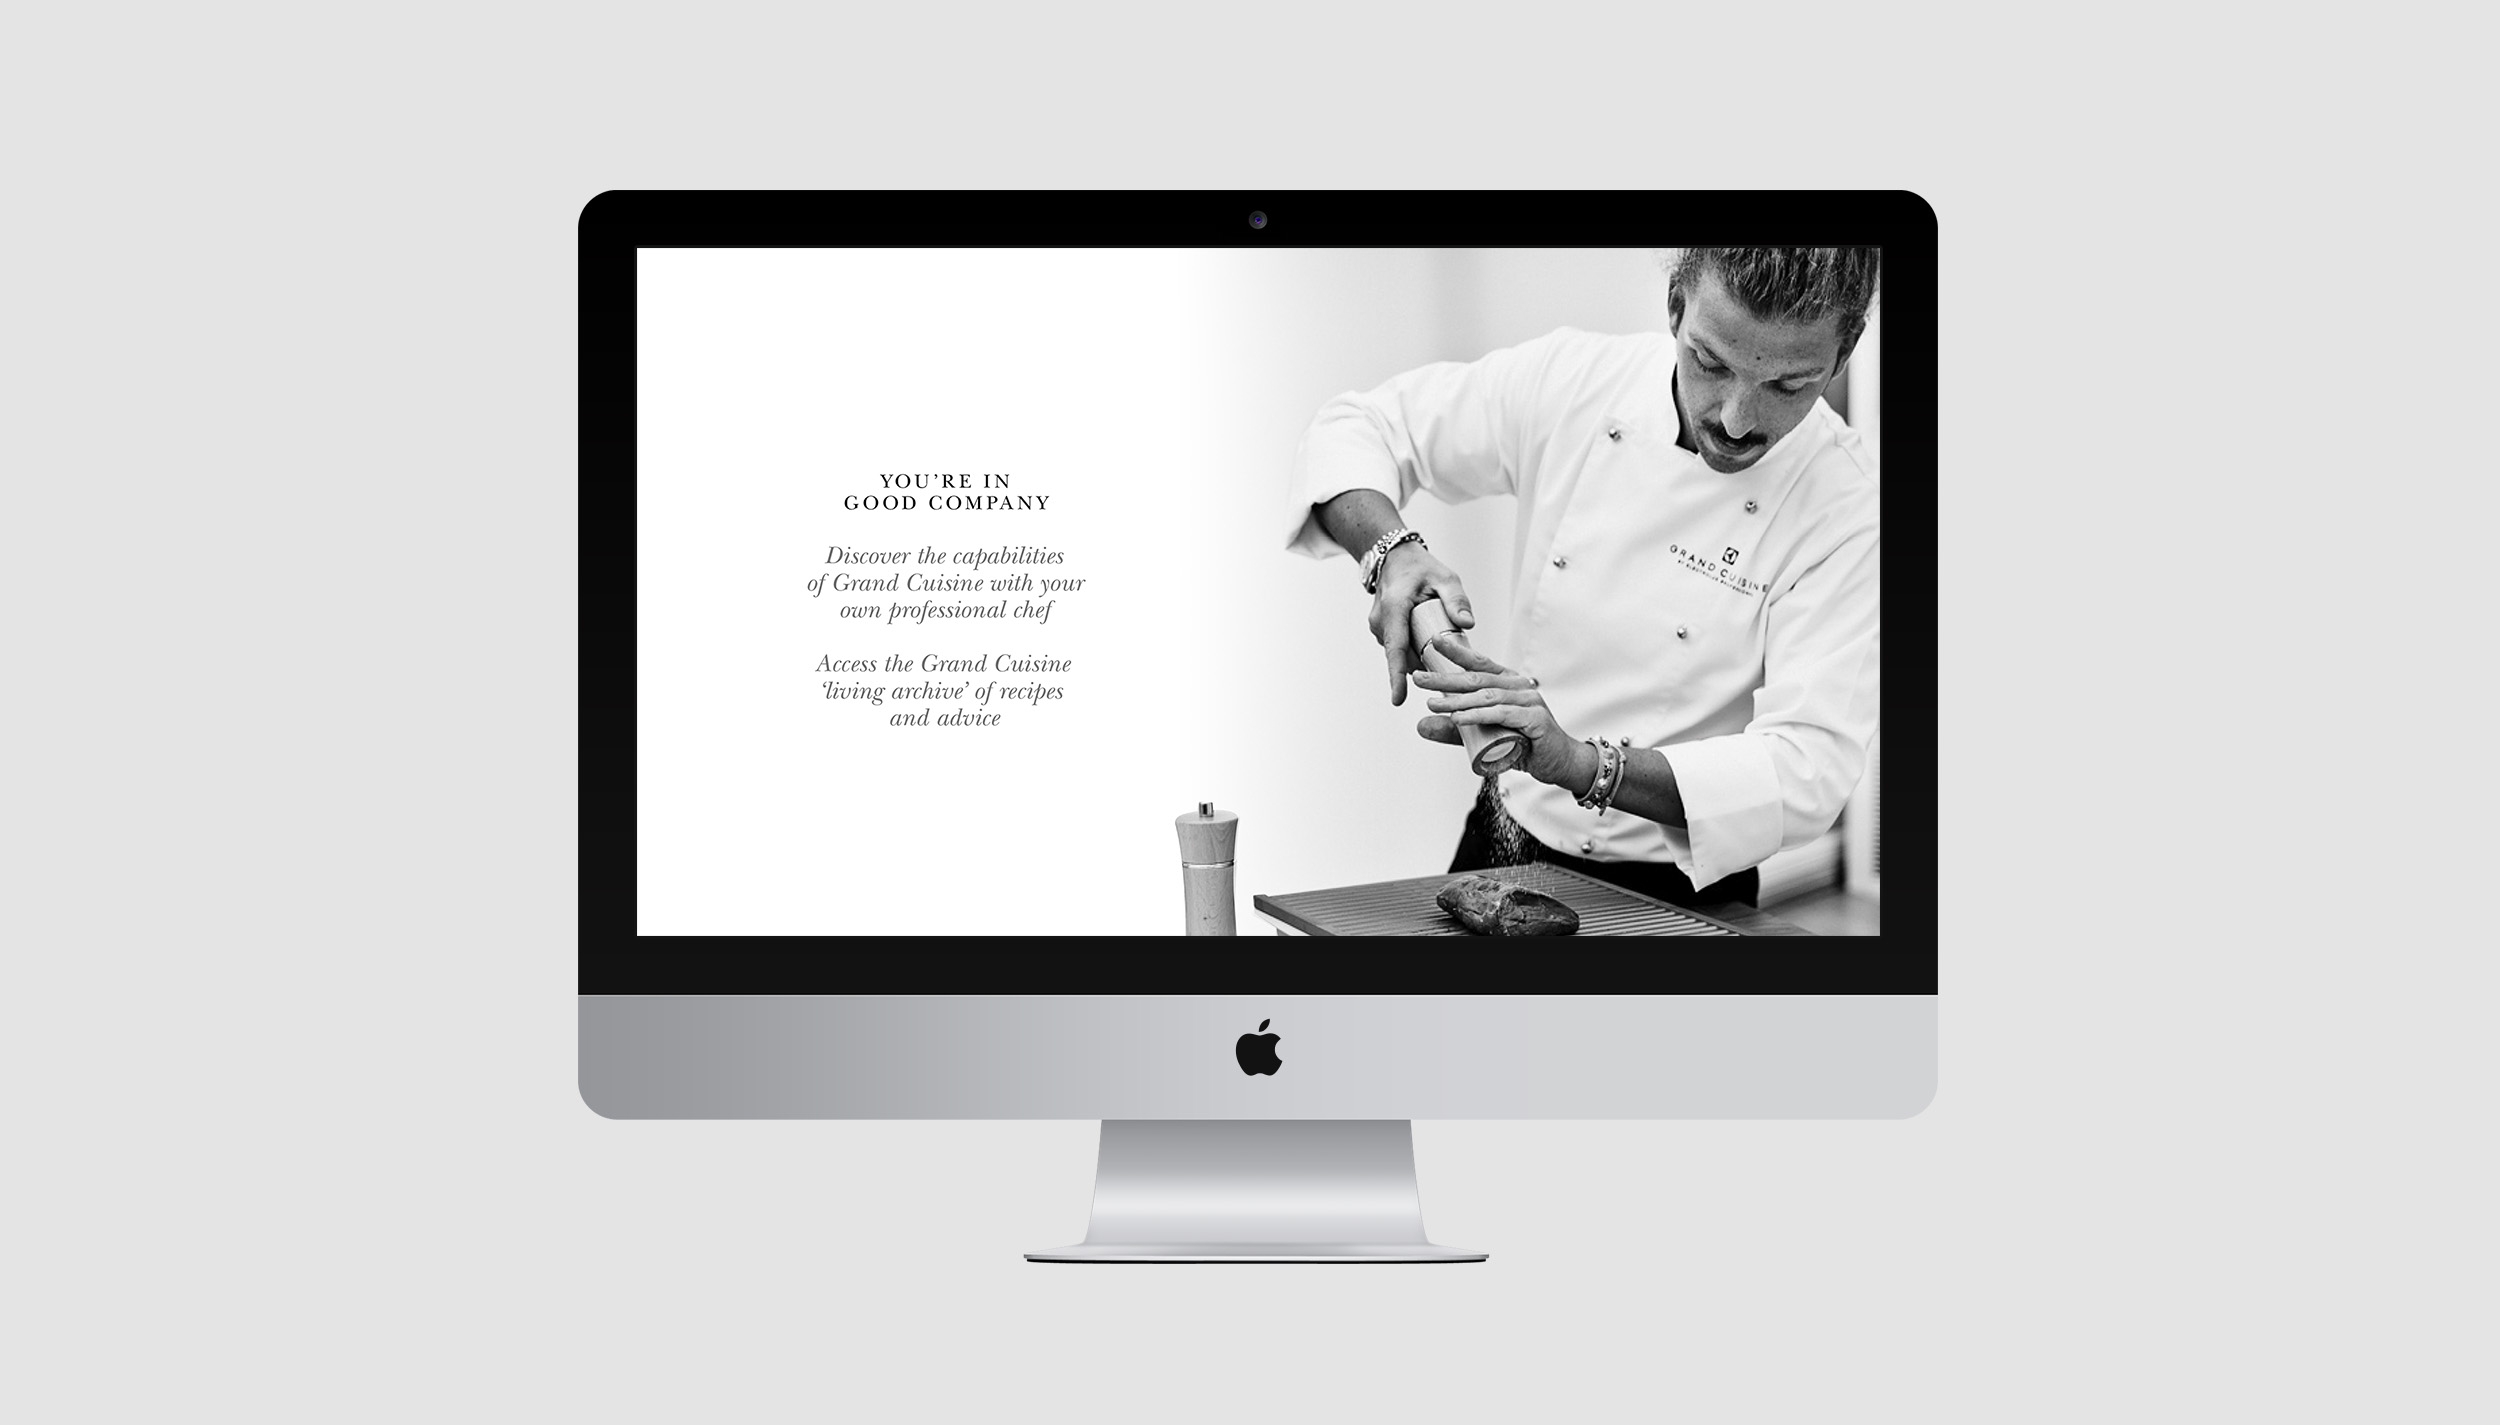 Anders Nord_Electrolux_Grand Cuisine_13.jpg